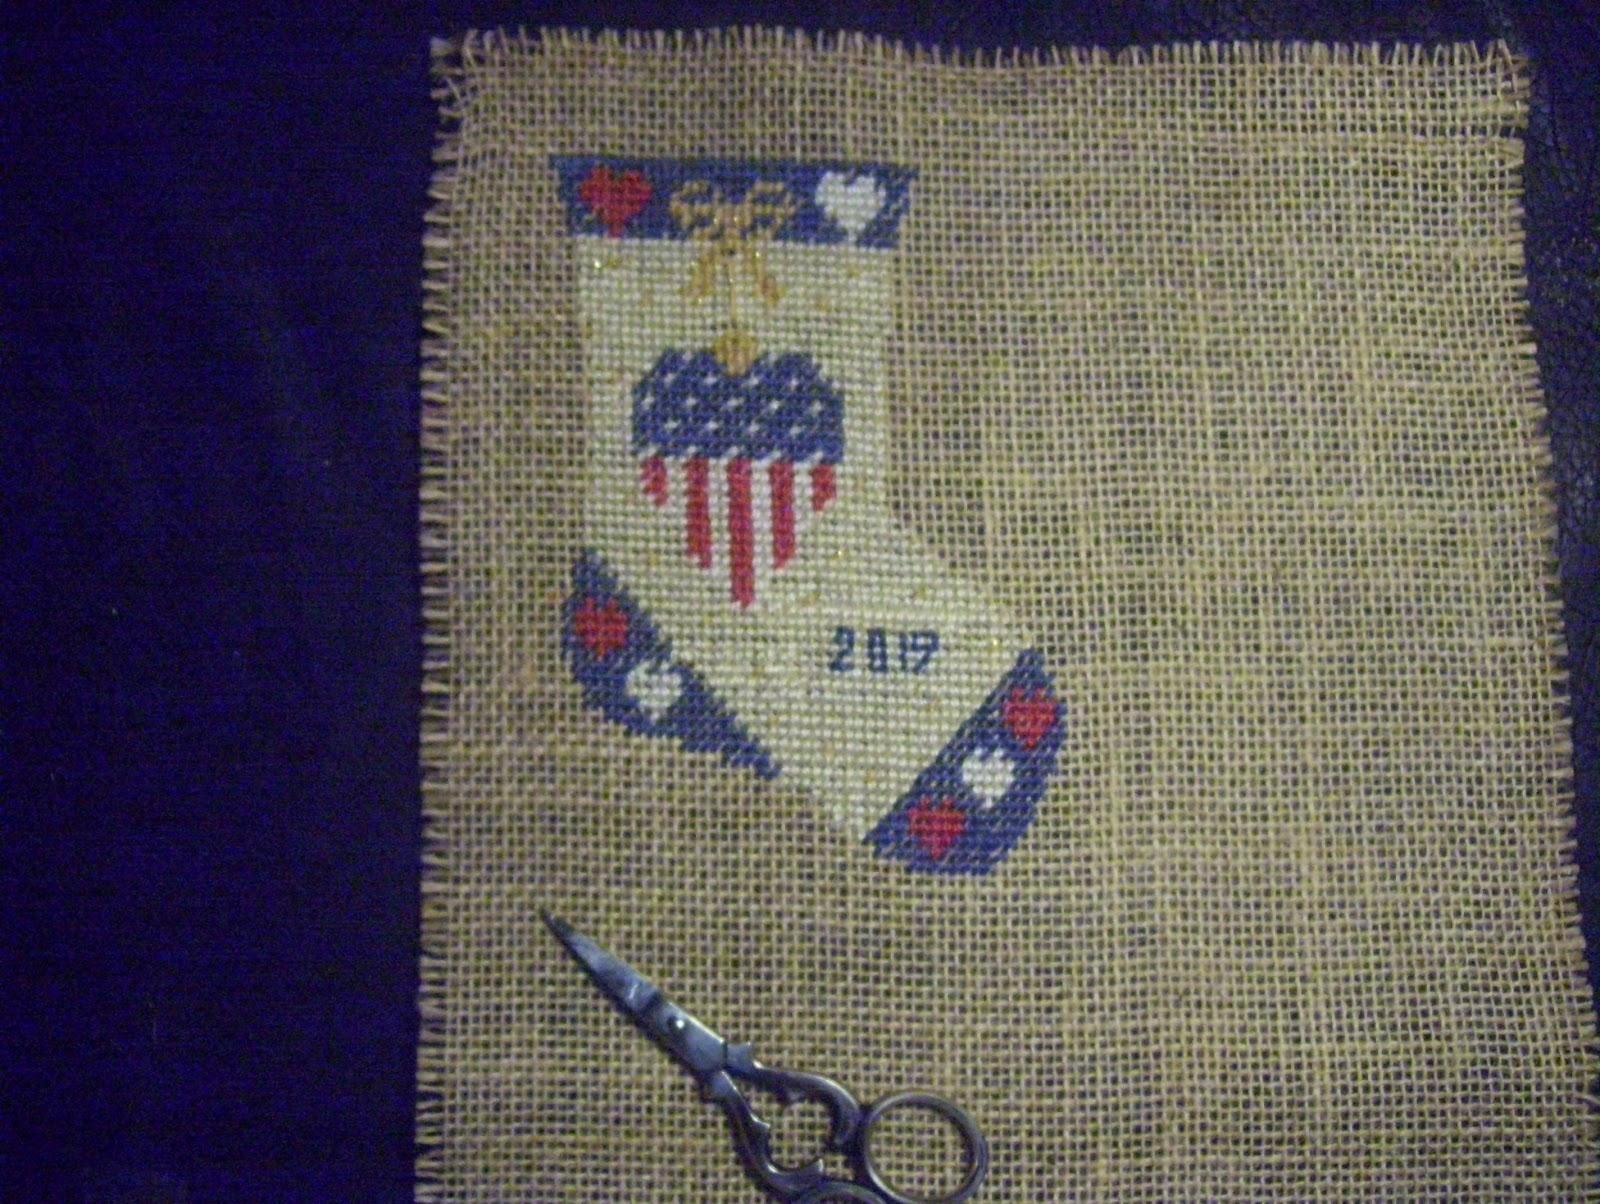 Christie's Cross Stitch Creations on Feedspot - Rss Feed